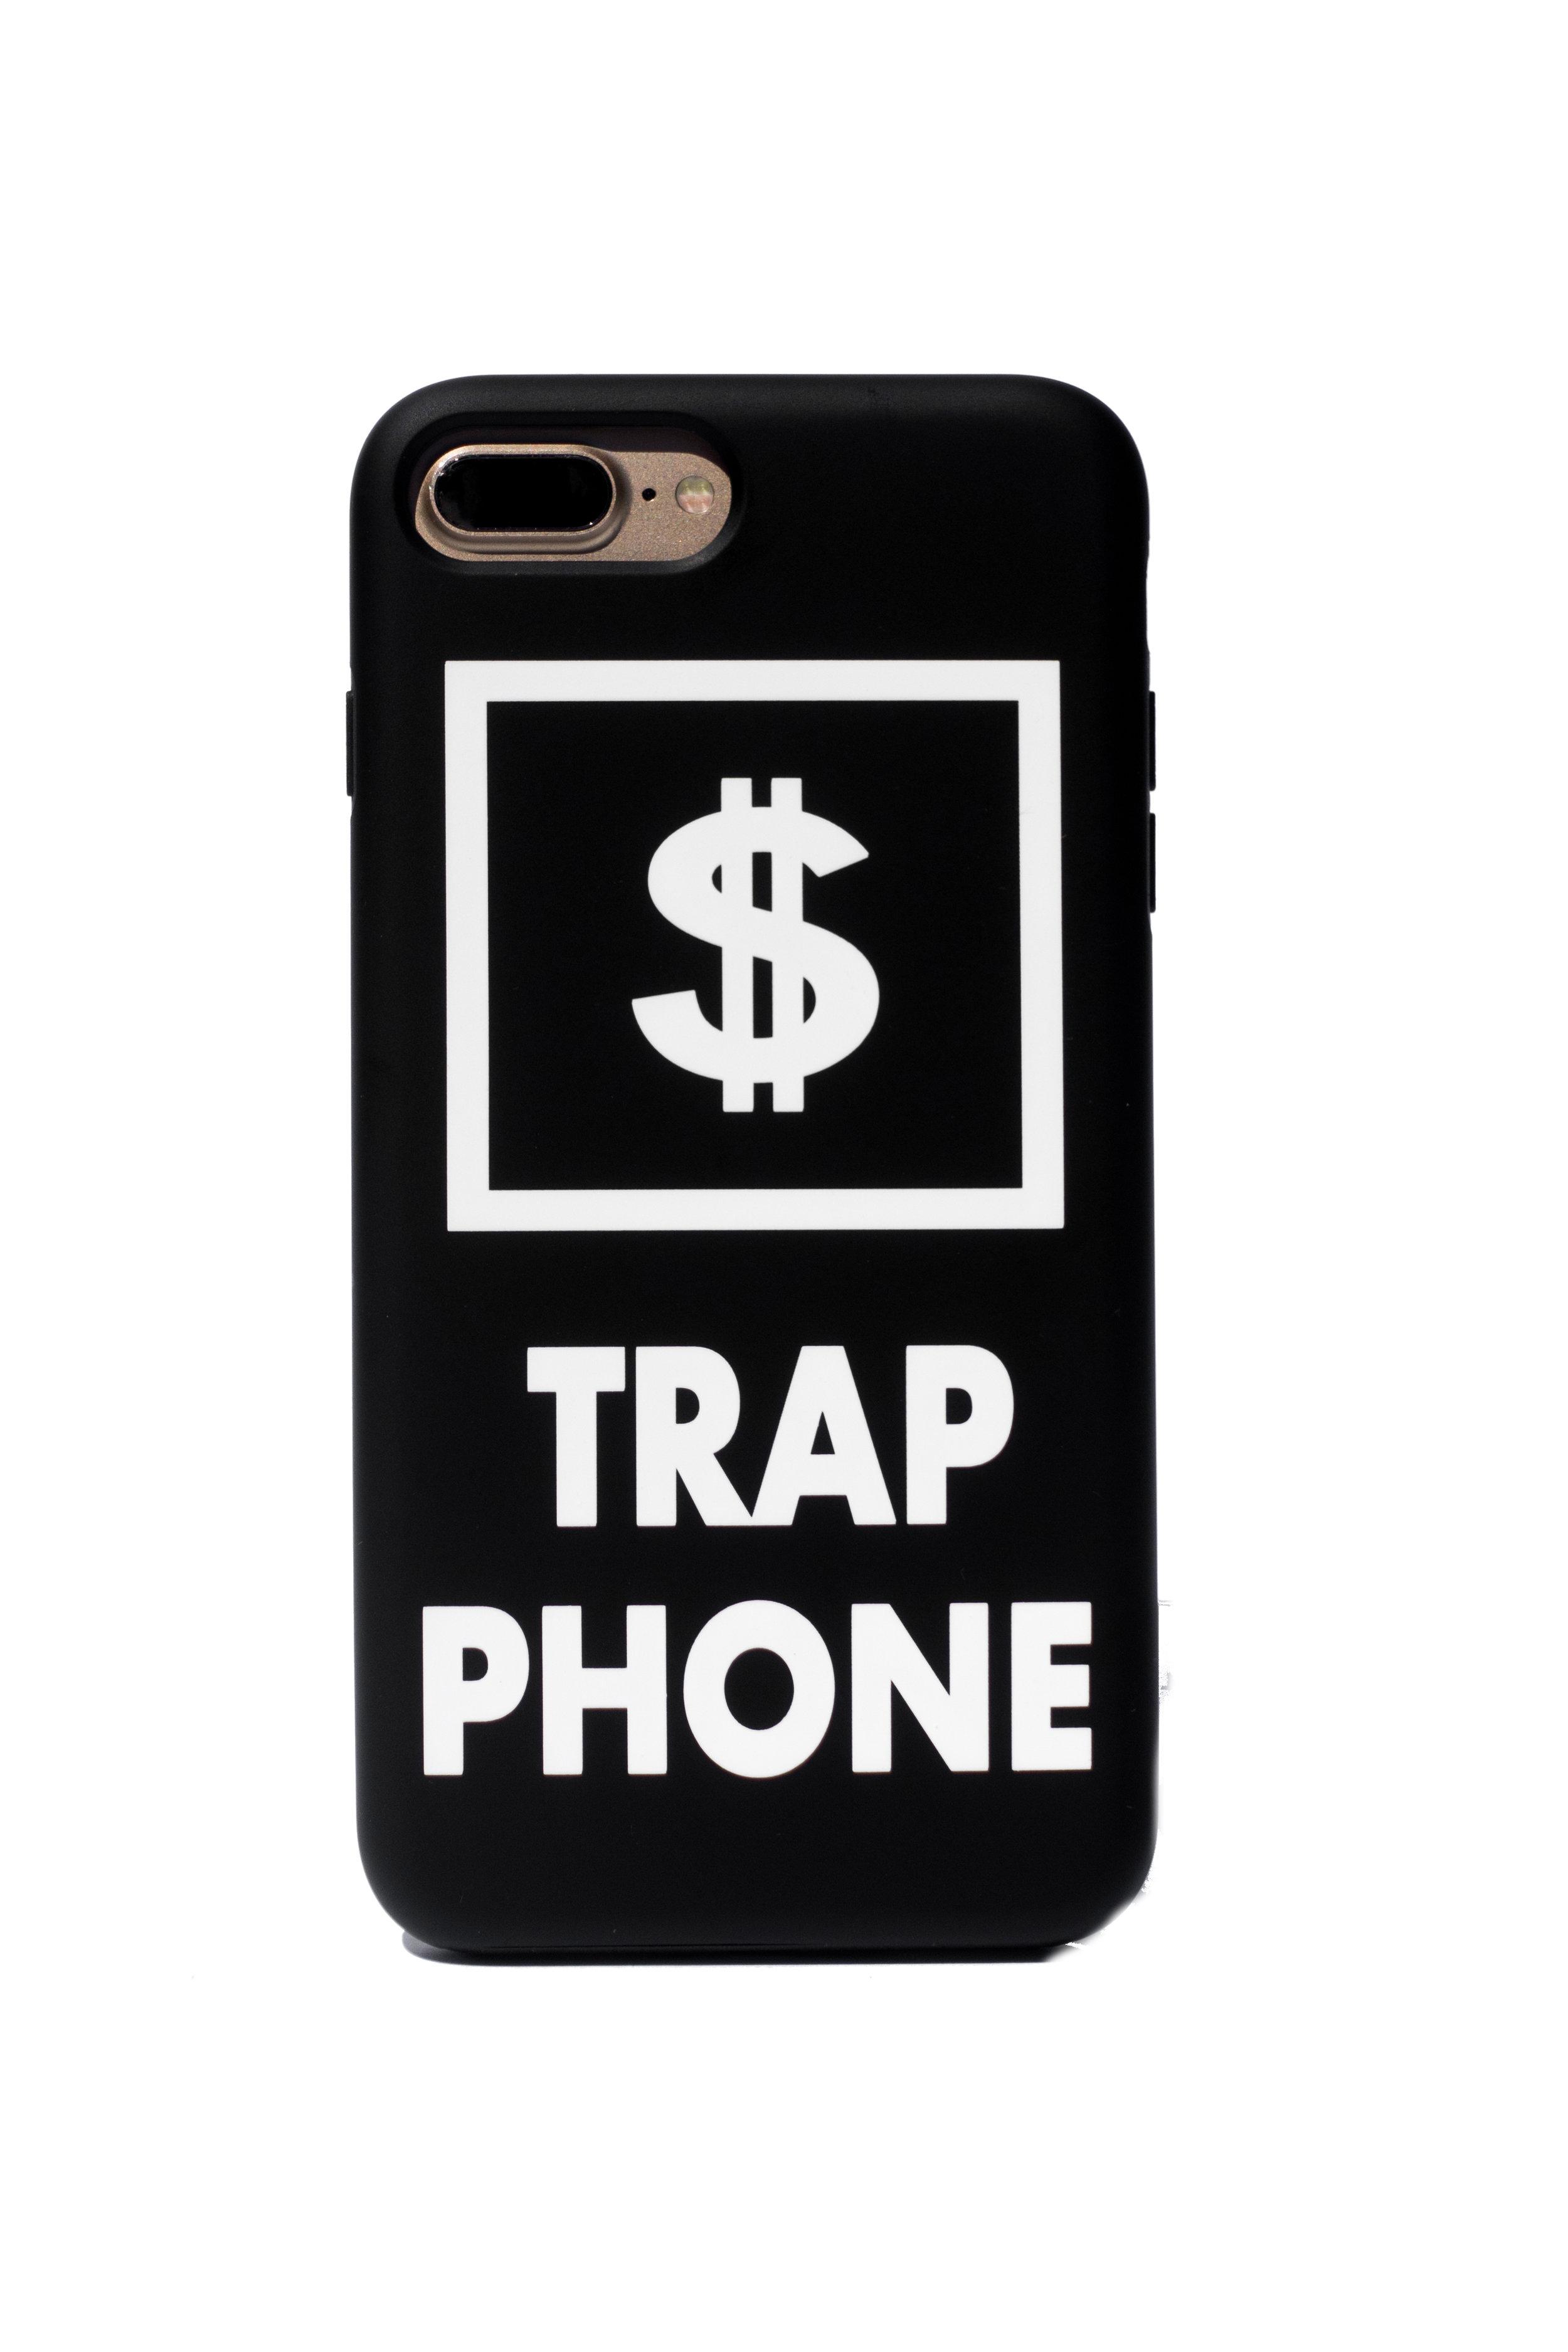 B-Trap-Phone-3.jpg